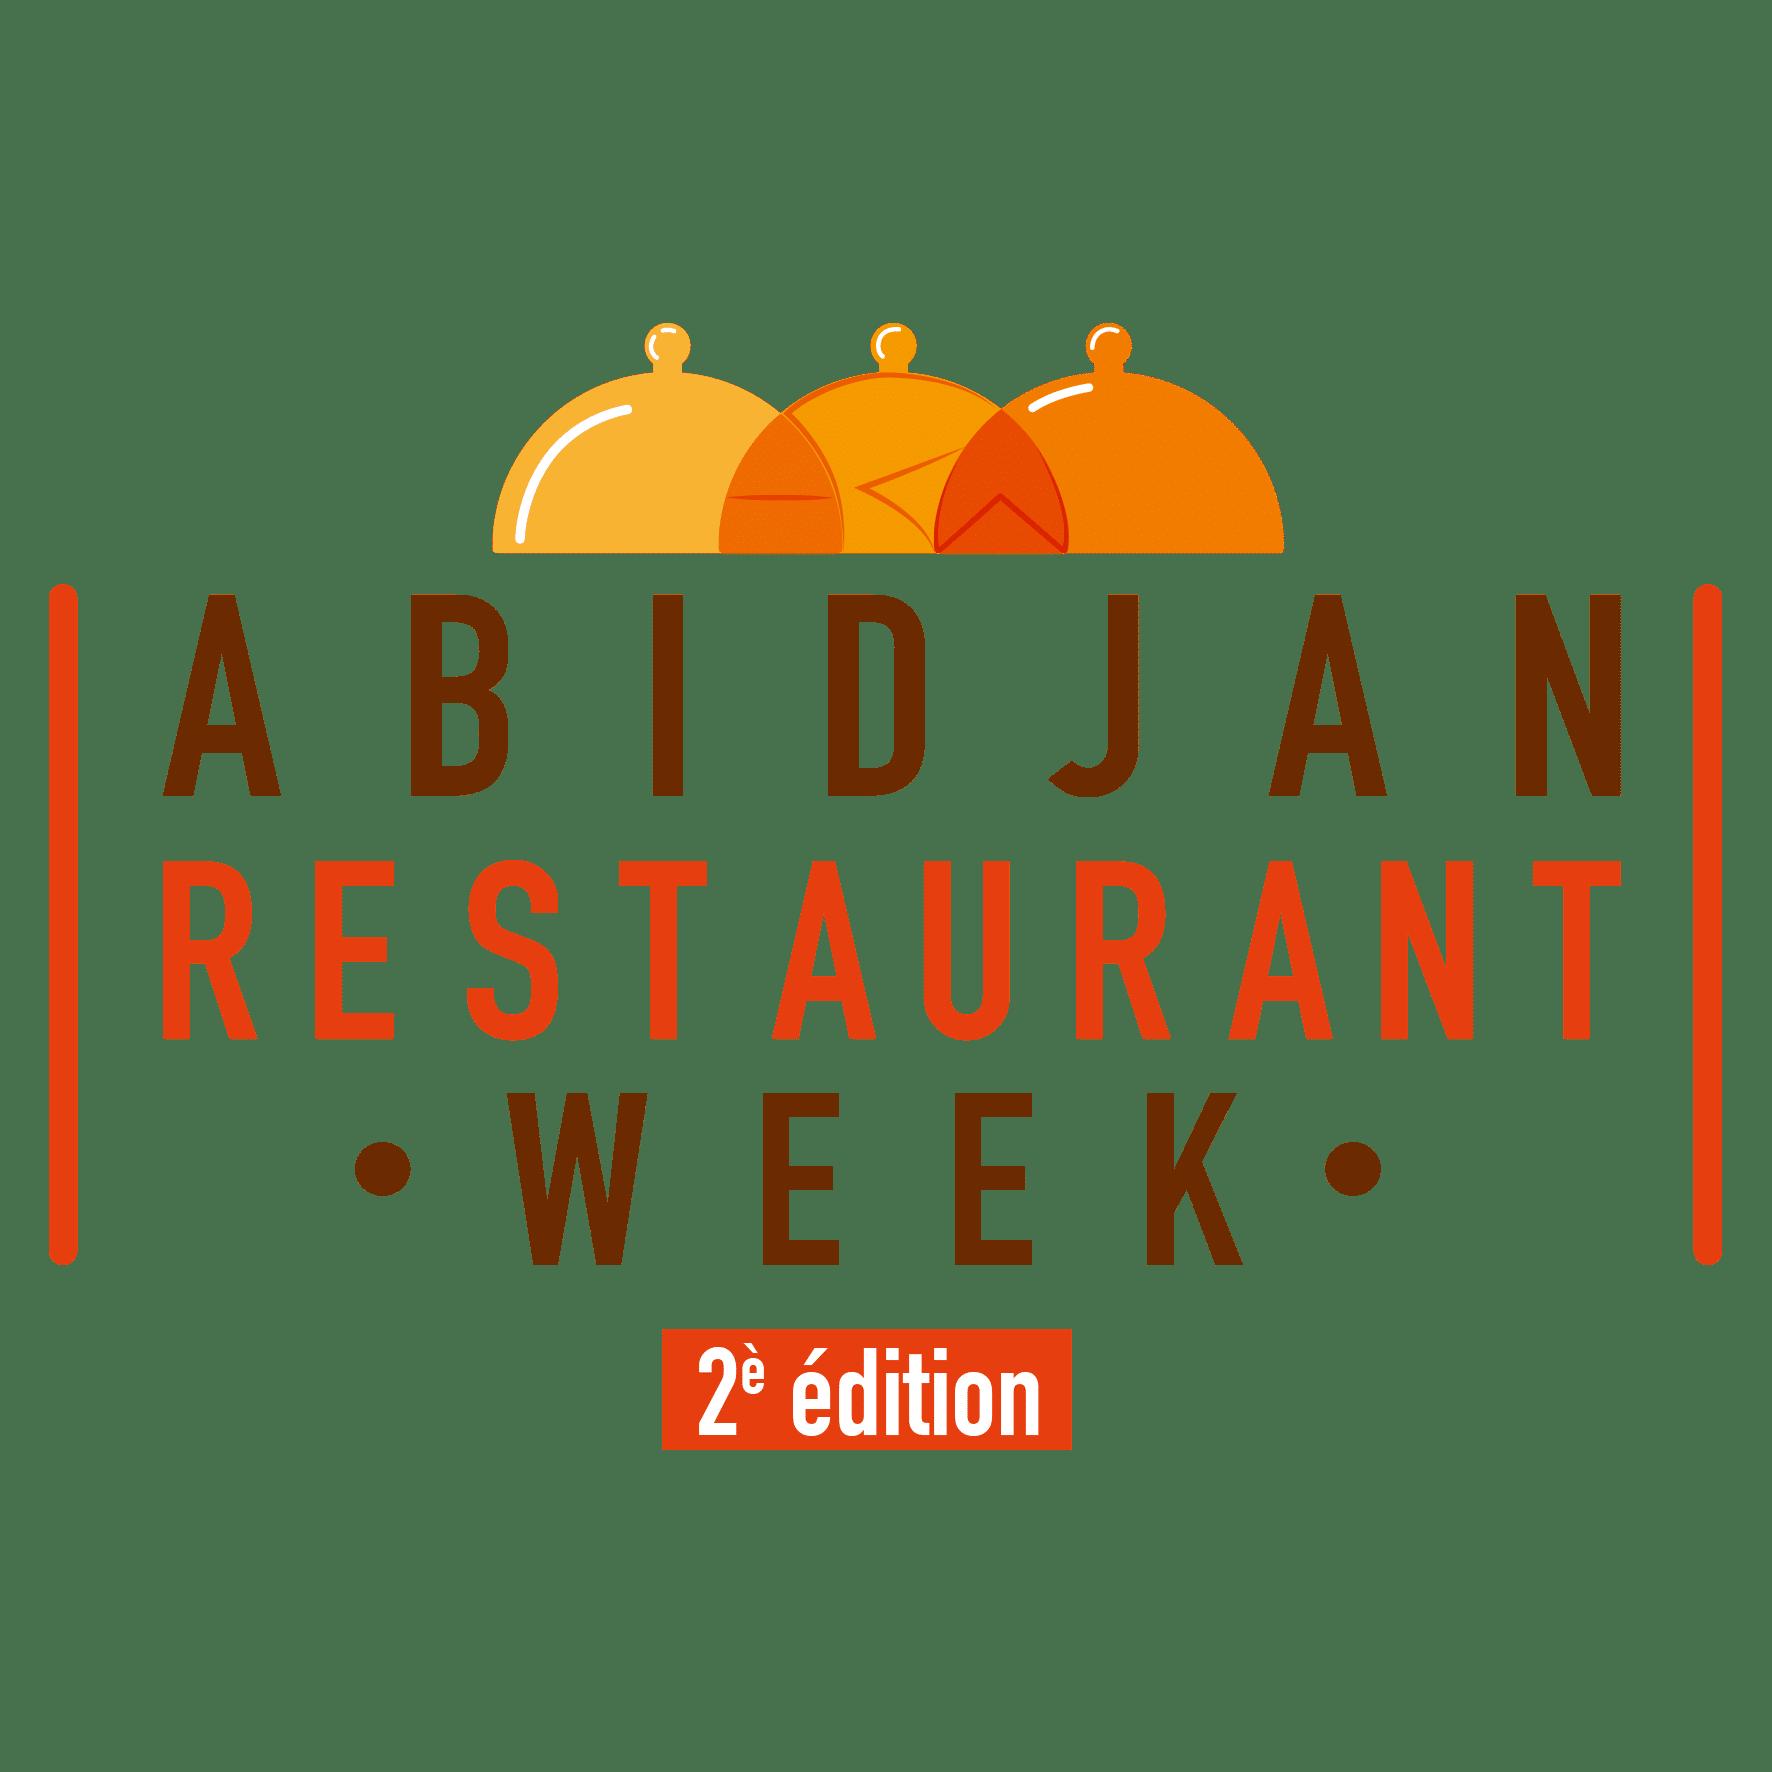 Abidjan Restaurant Week